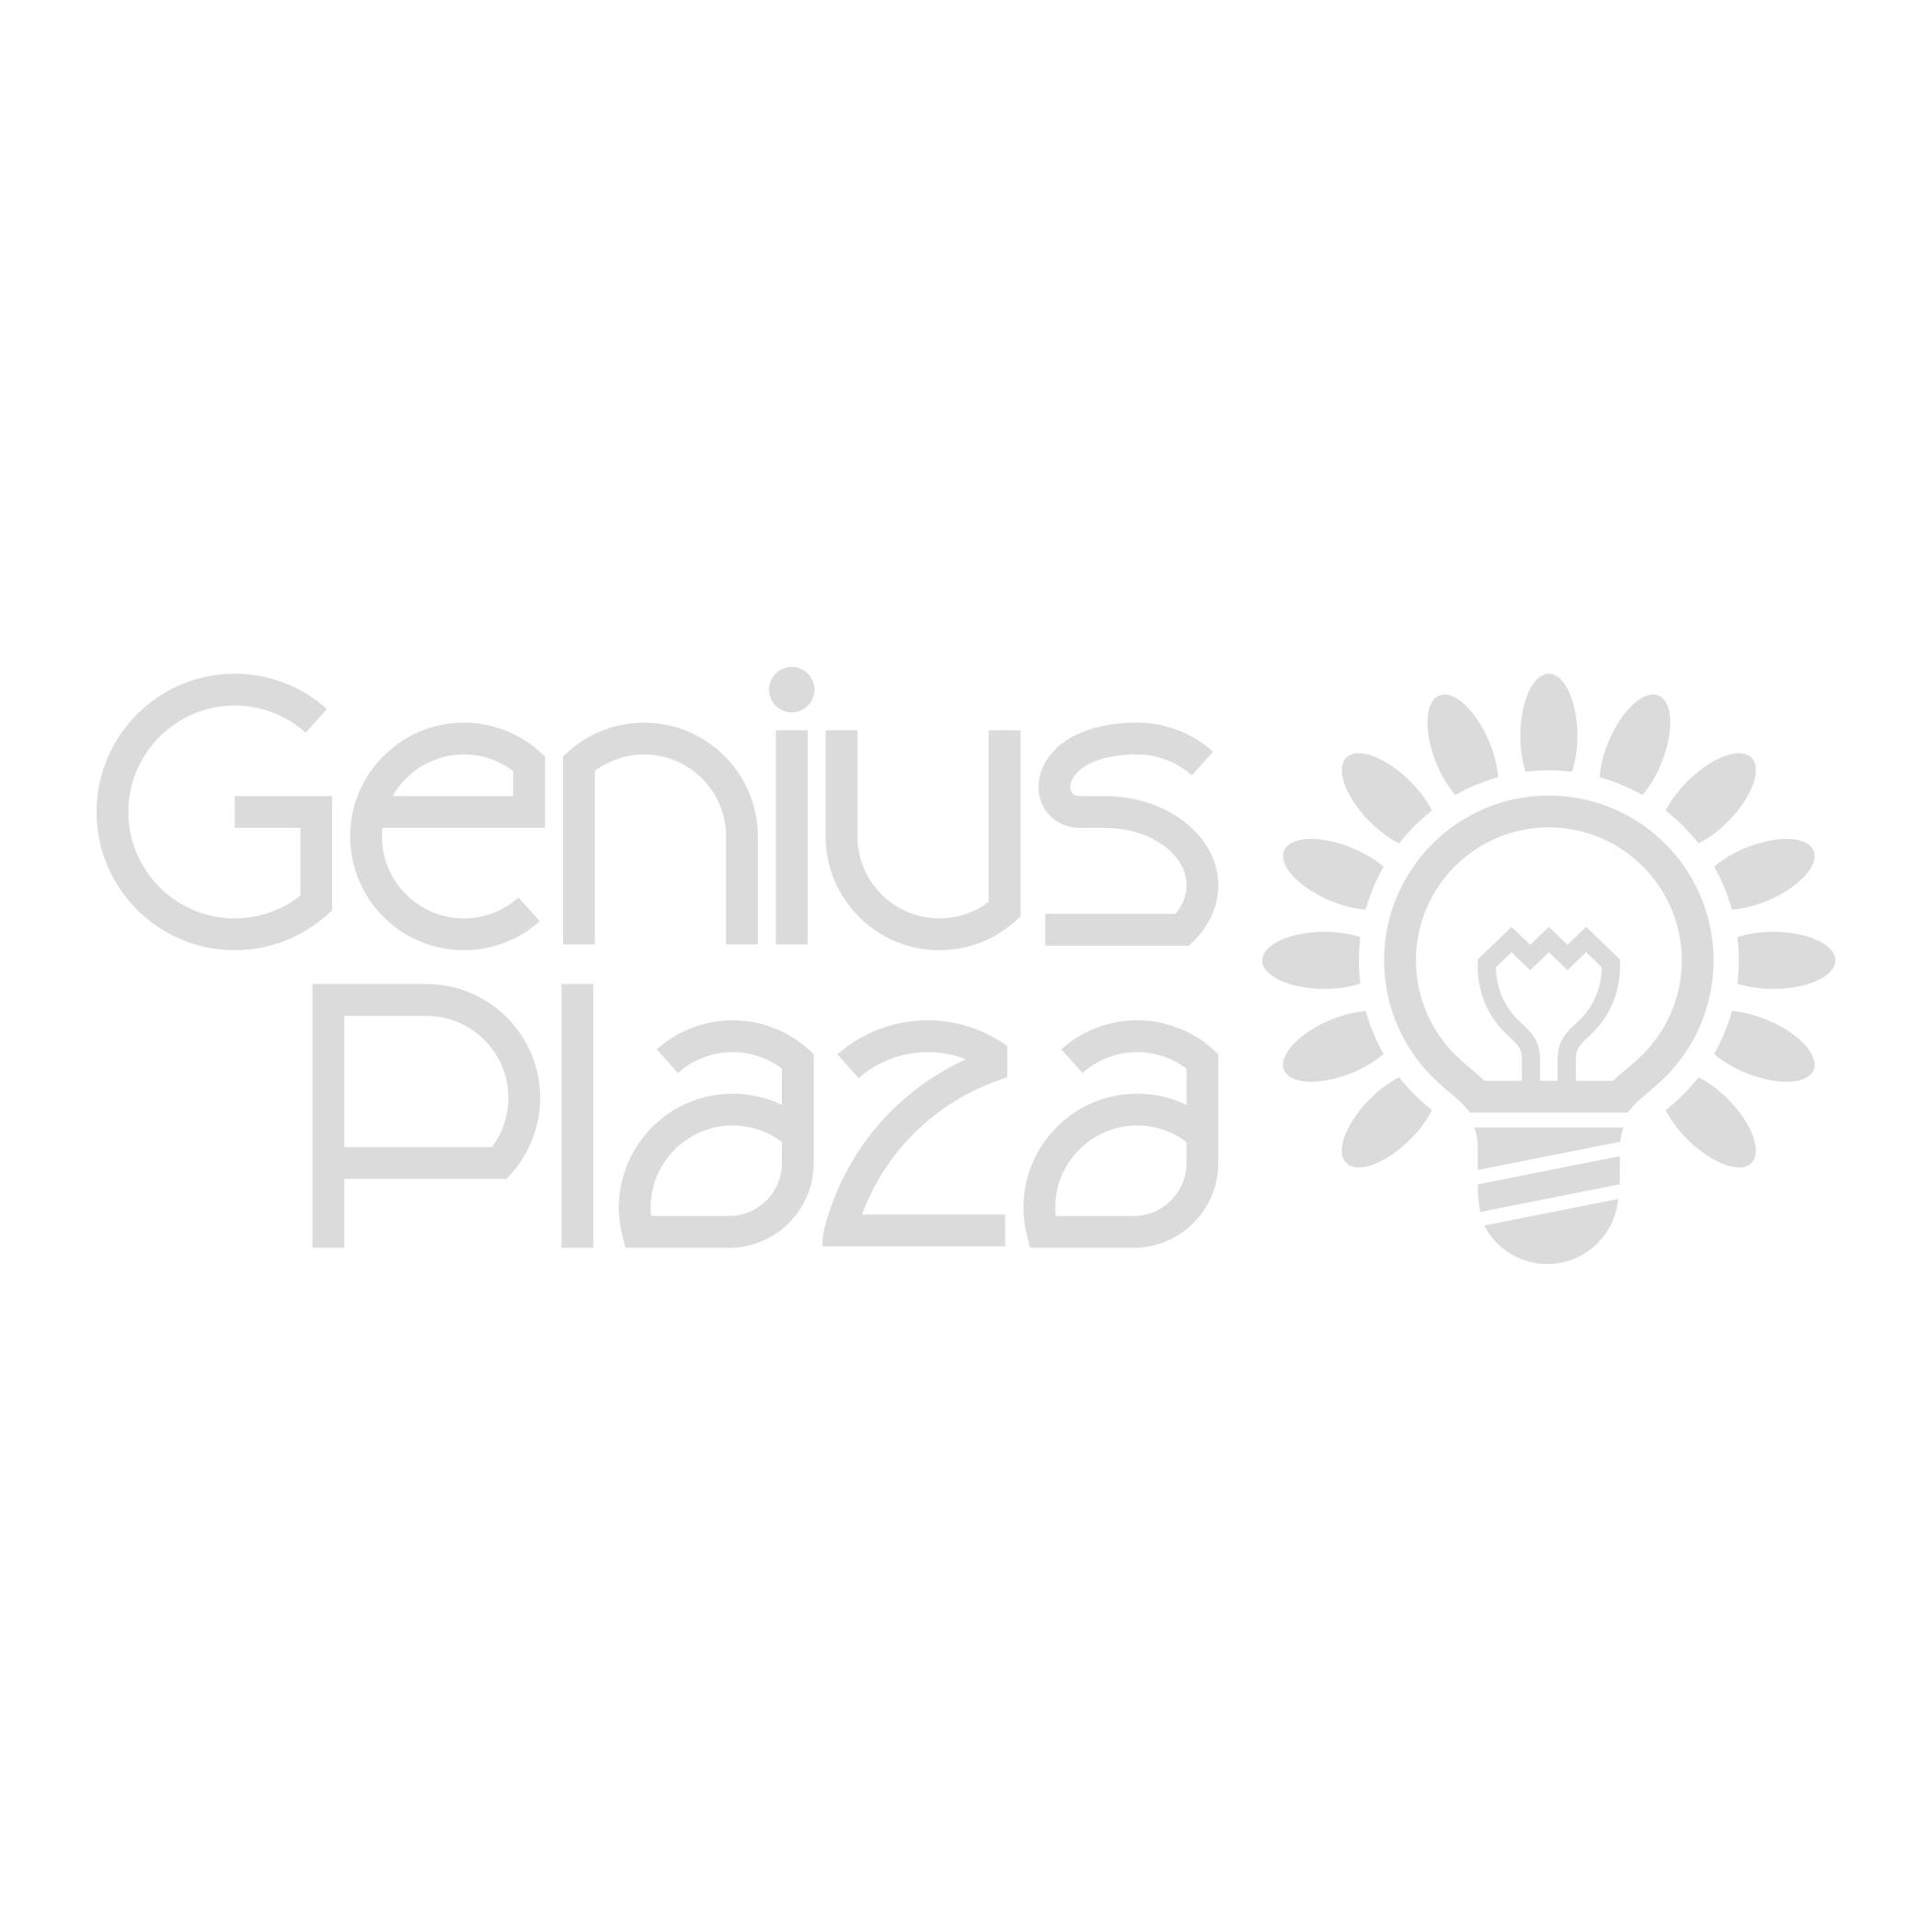 GeniusPlaza.png